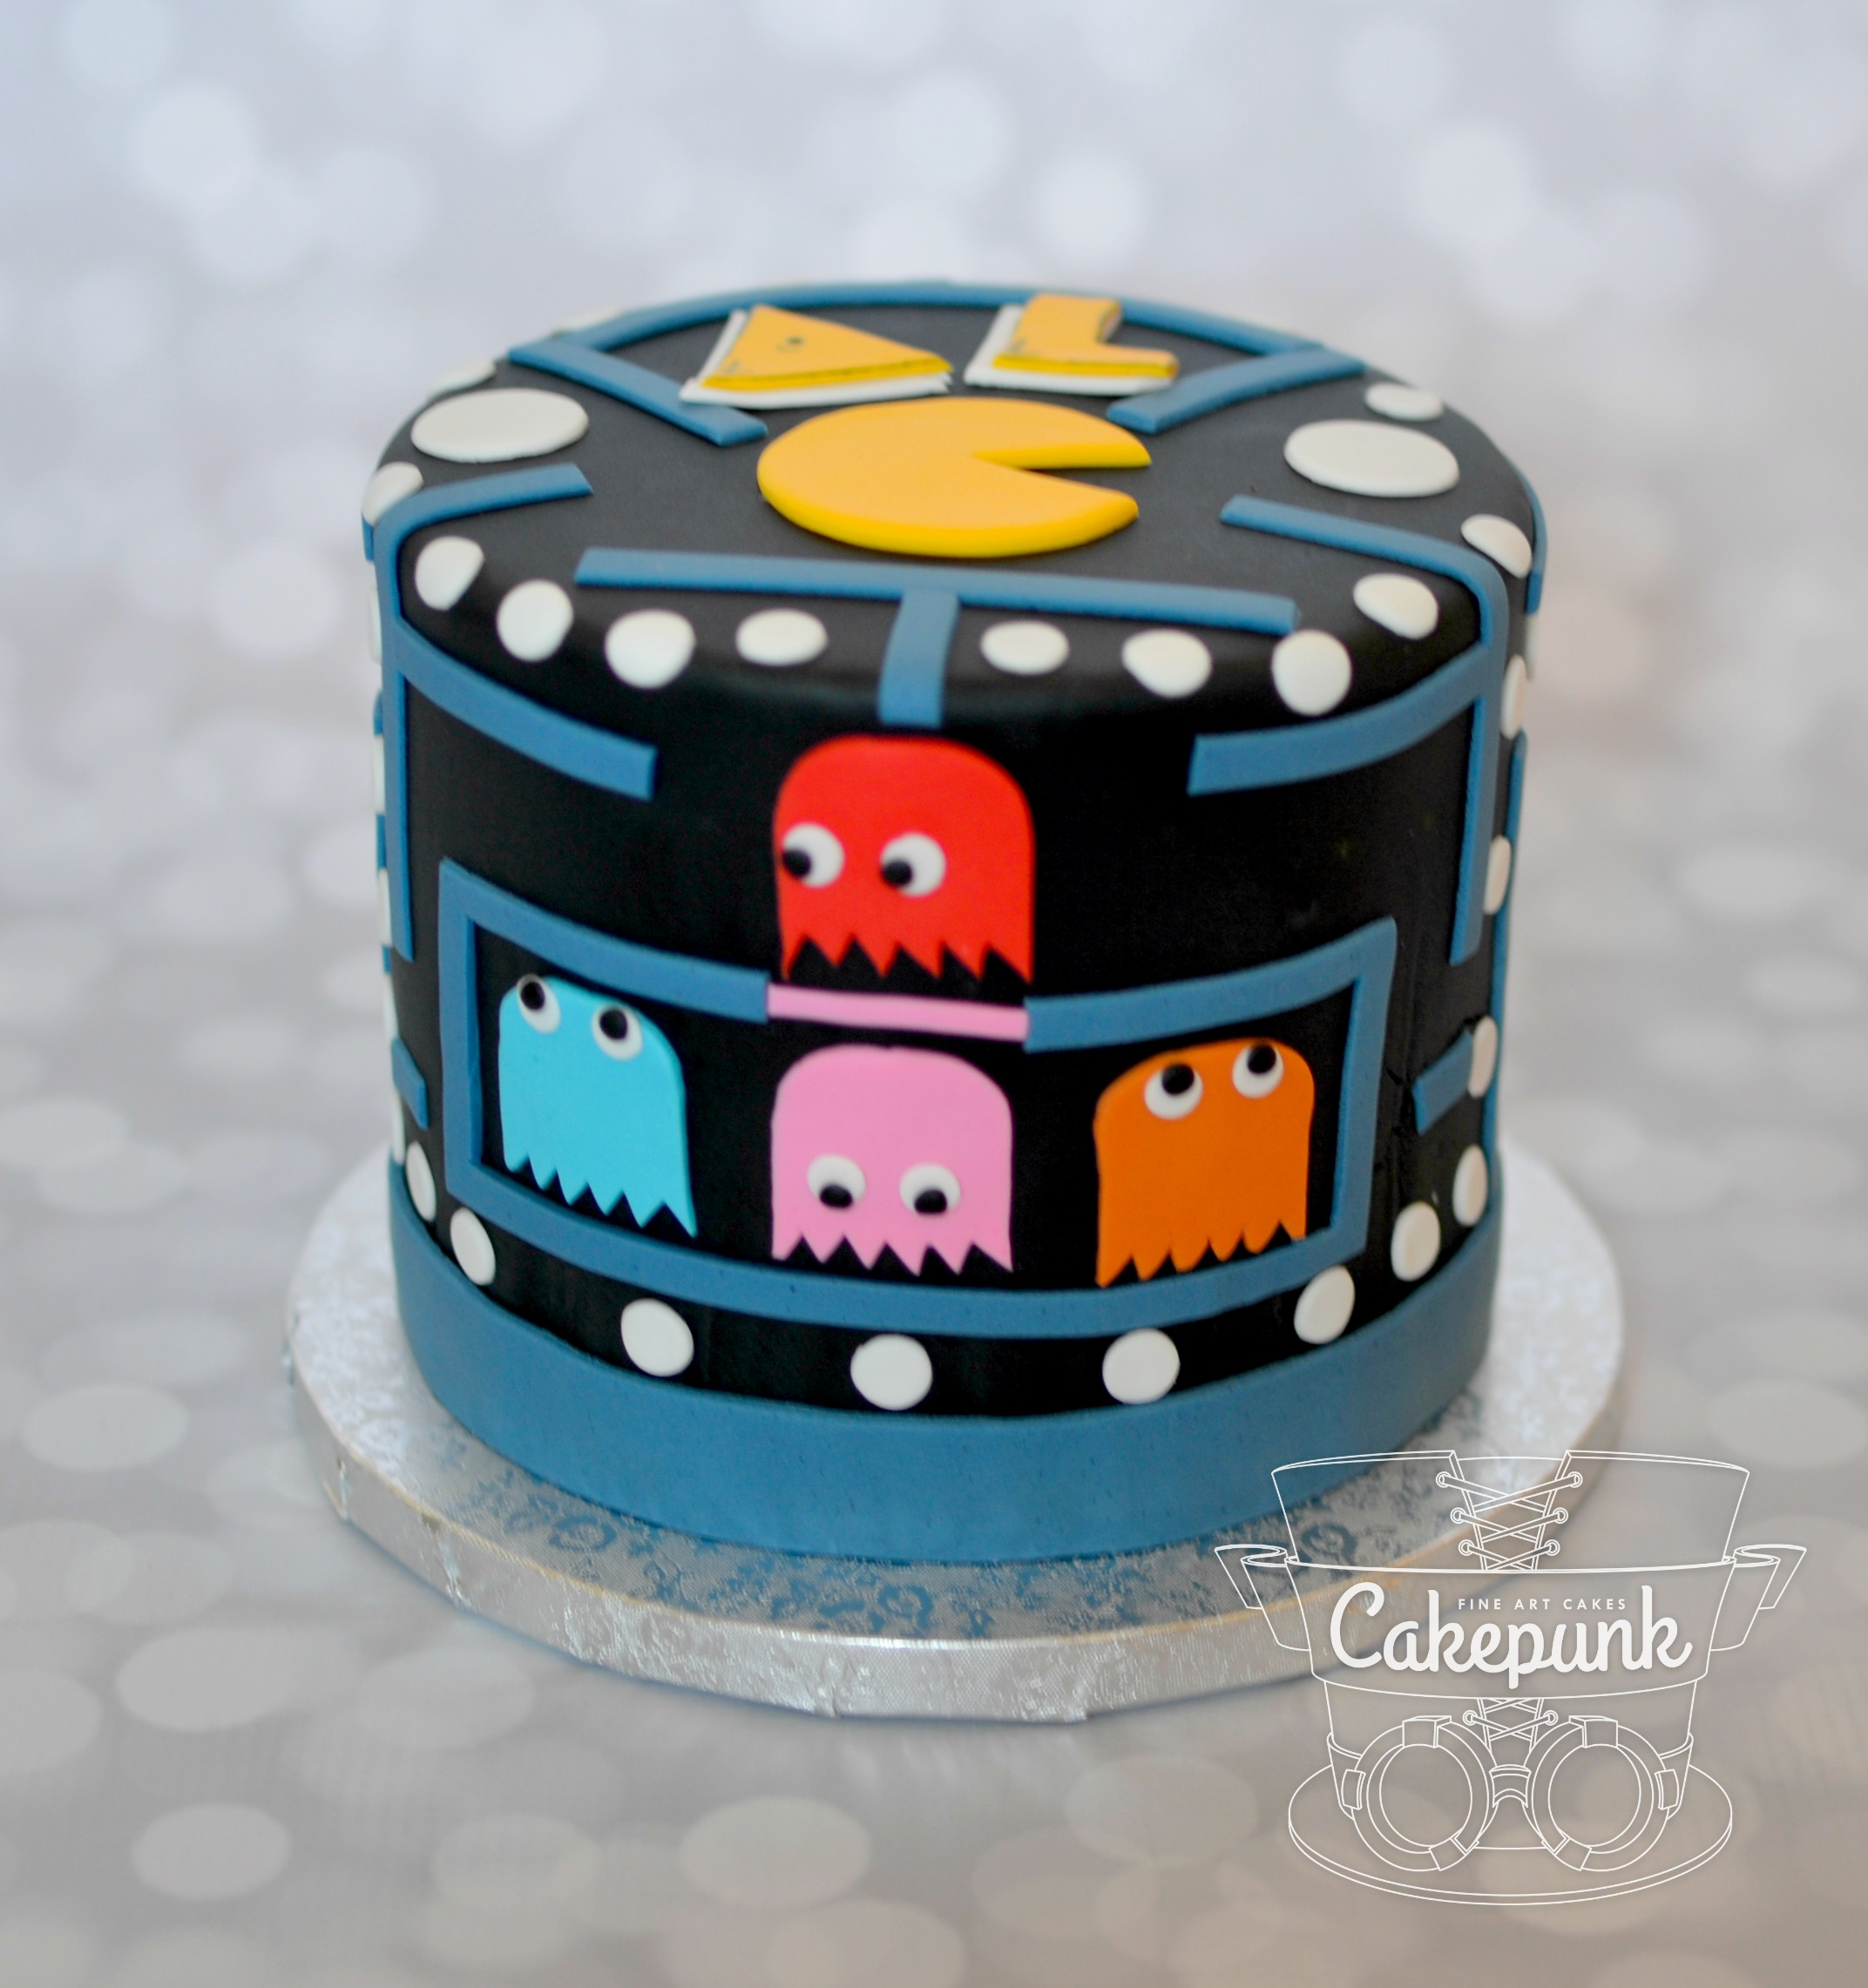 Groovy Childrens Cakes Cakepunk Calgary Funny Birthday Cards Online Alyptdamsfinfo